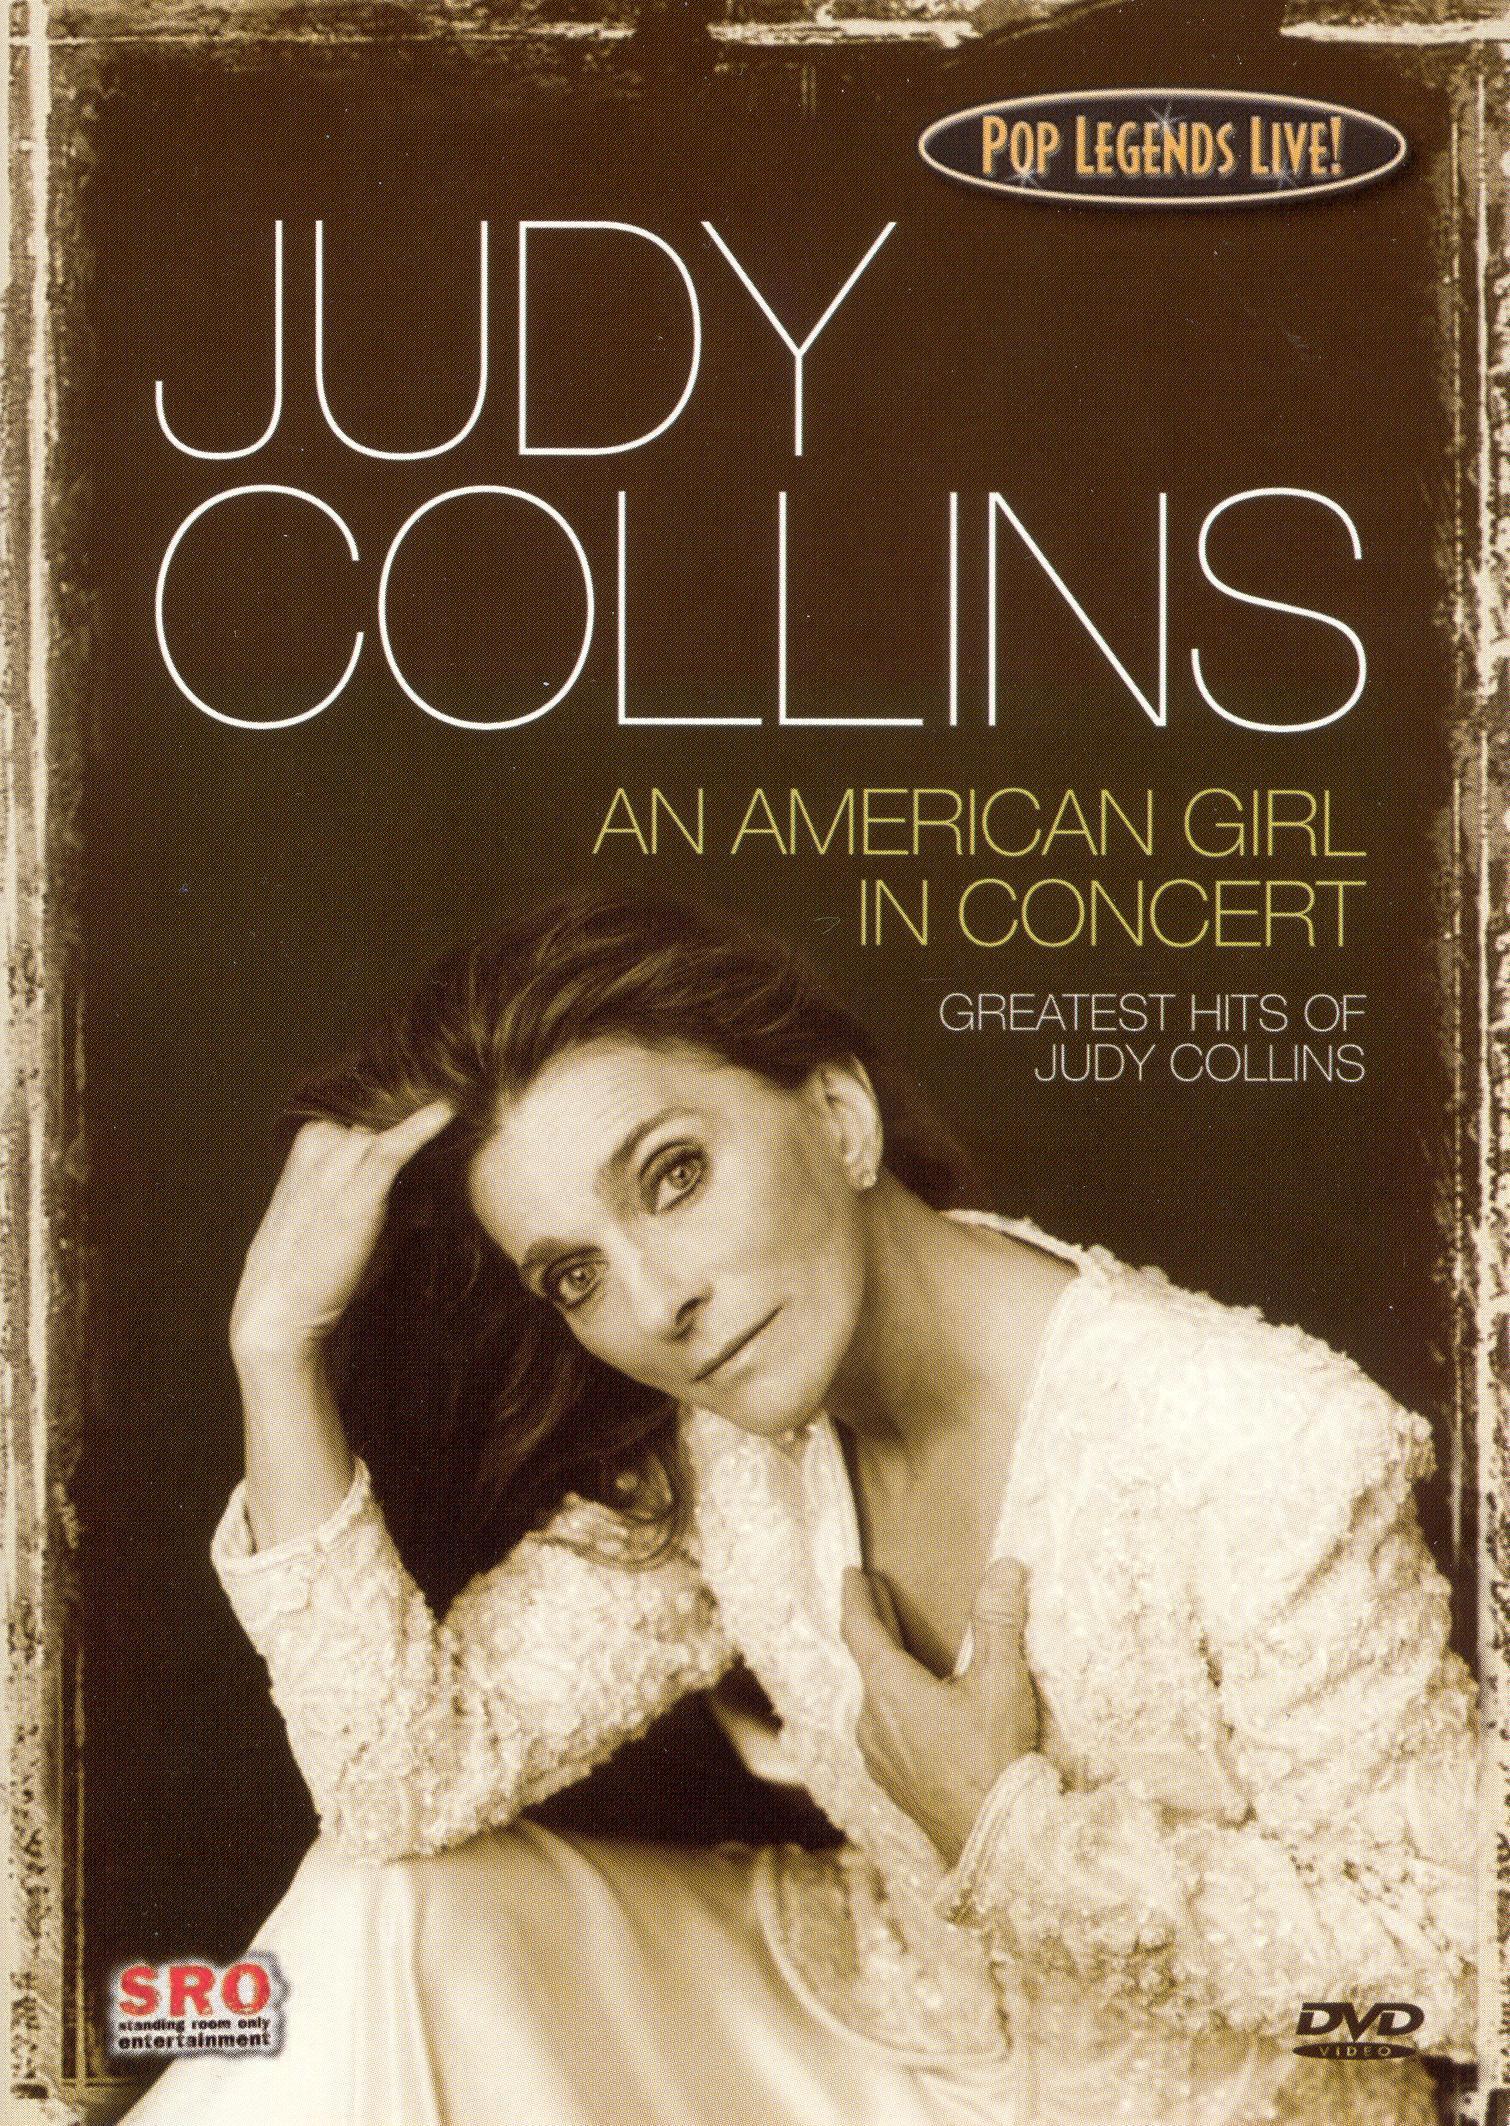 Judy Collins: Pop Legends Live